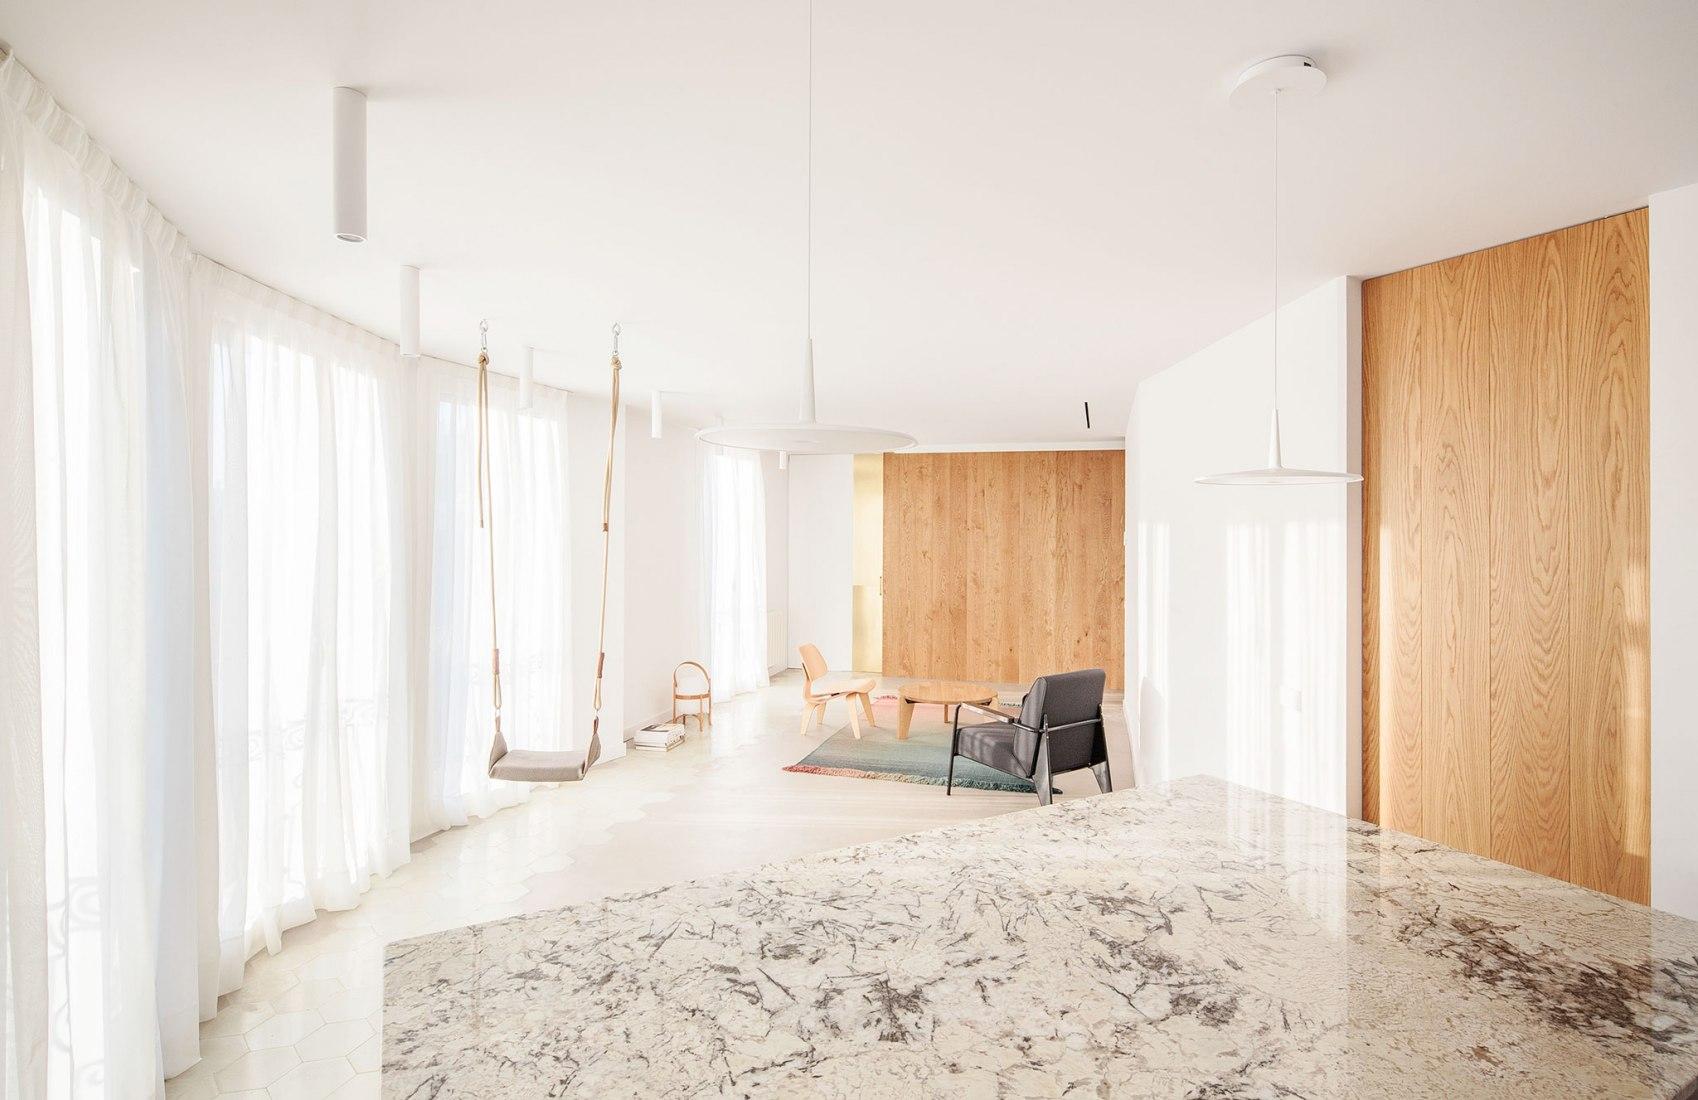 Atic Aribau por Raúl Sánchez Architects. Fotografía por David Zarzoso